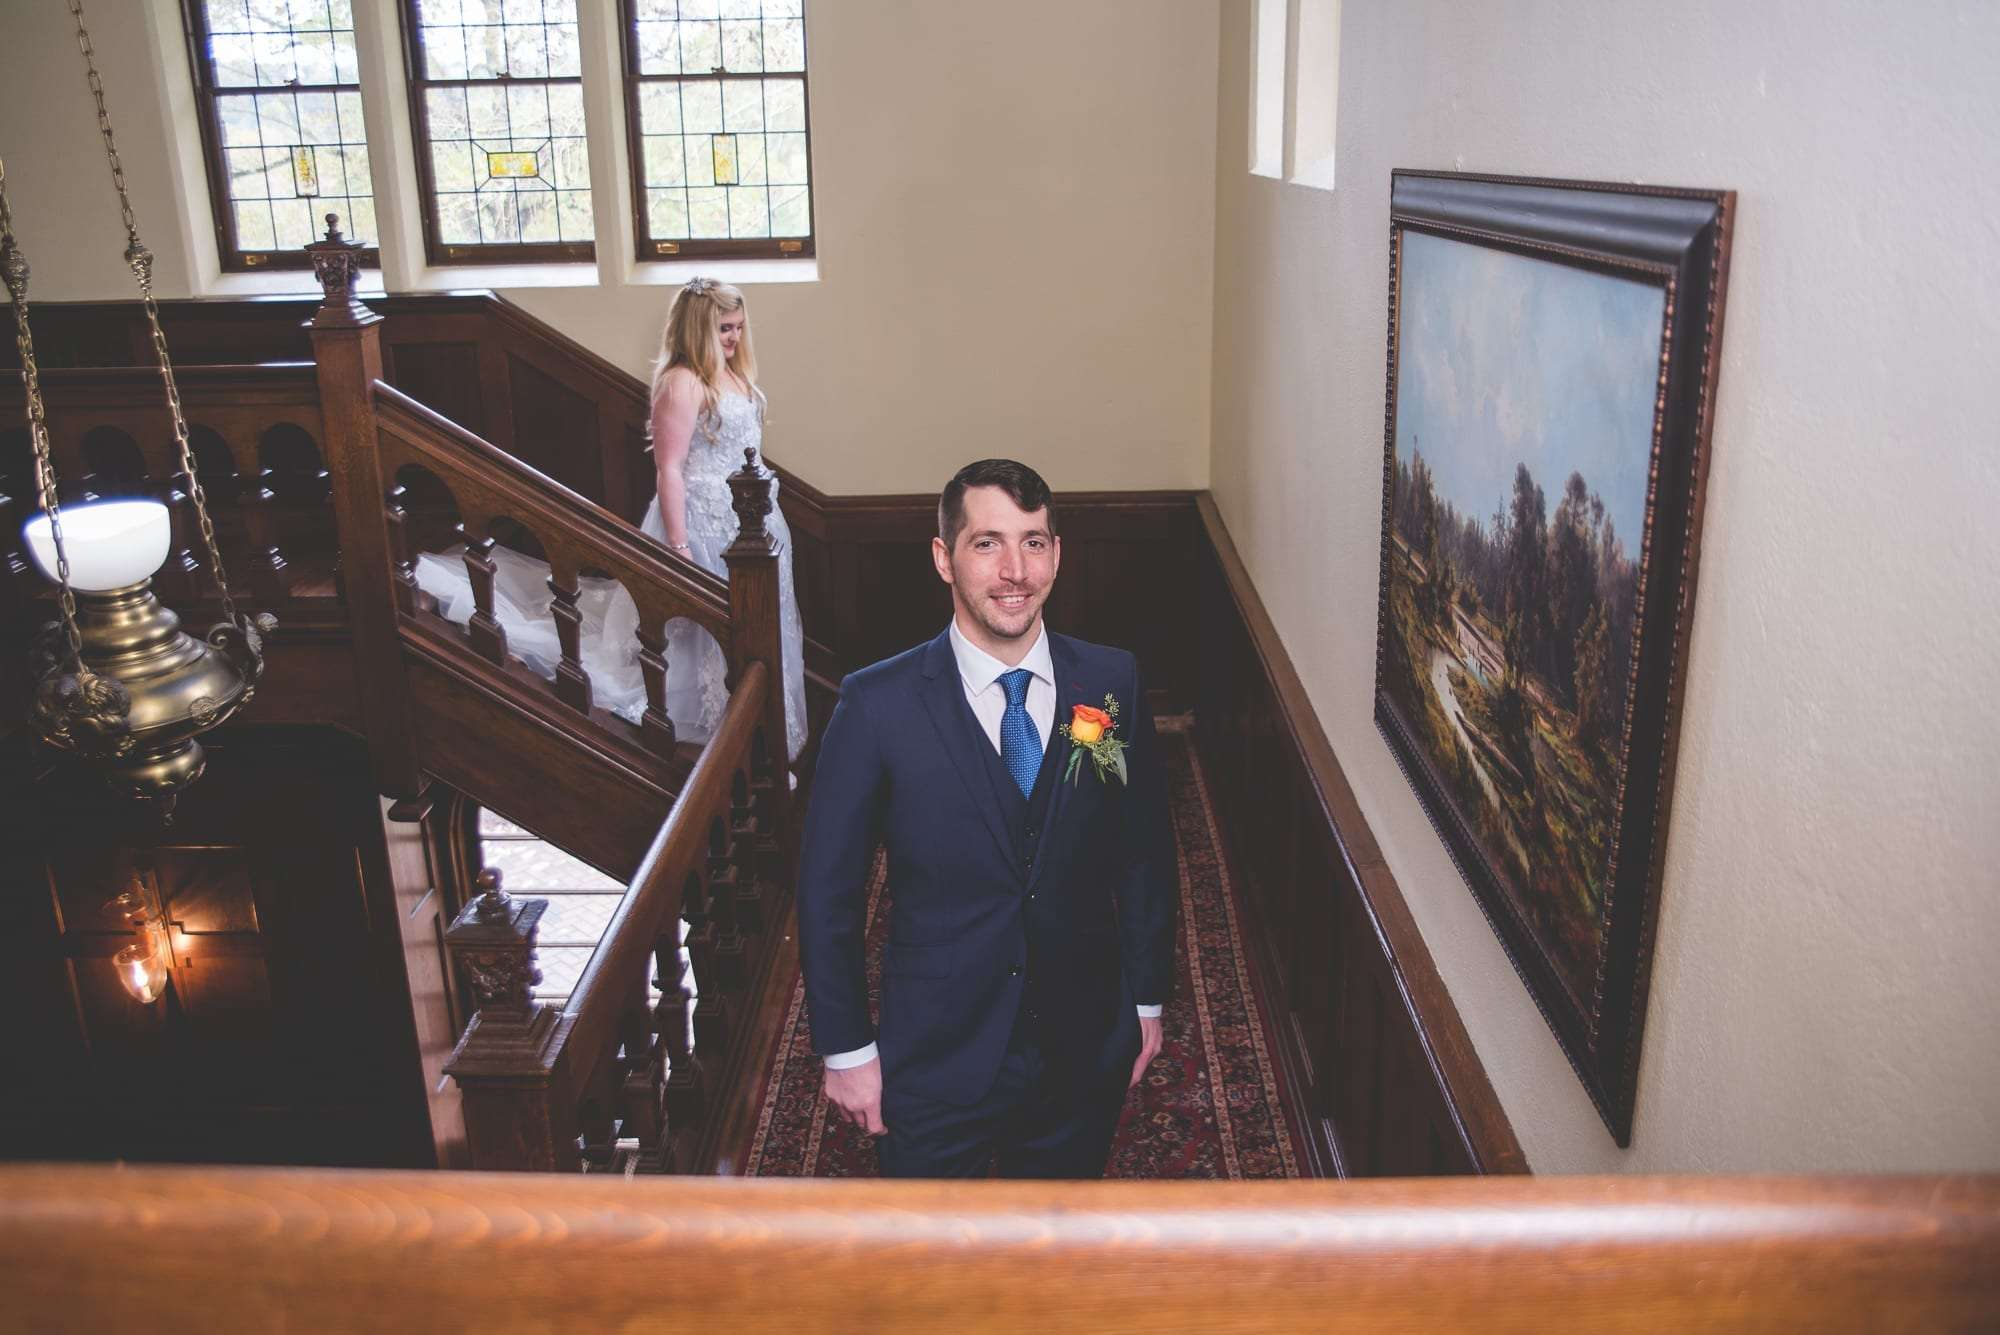 First look at Villanova Inn Philadelphia wedding photographer